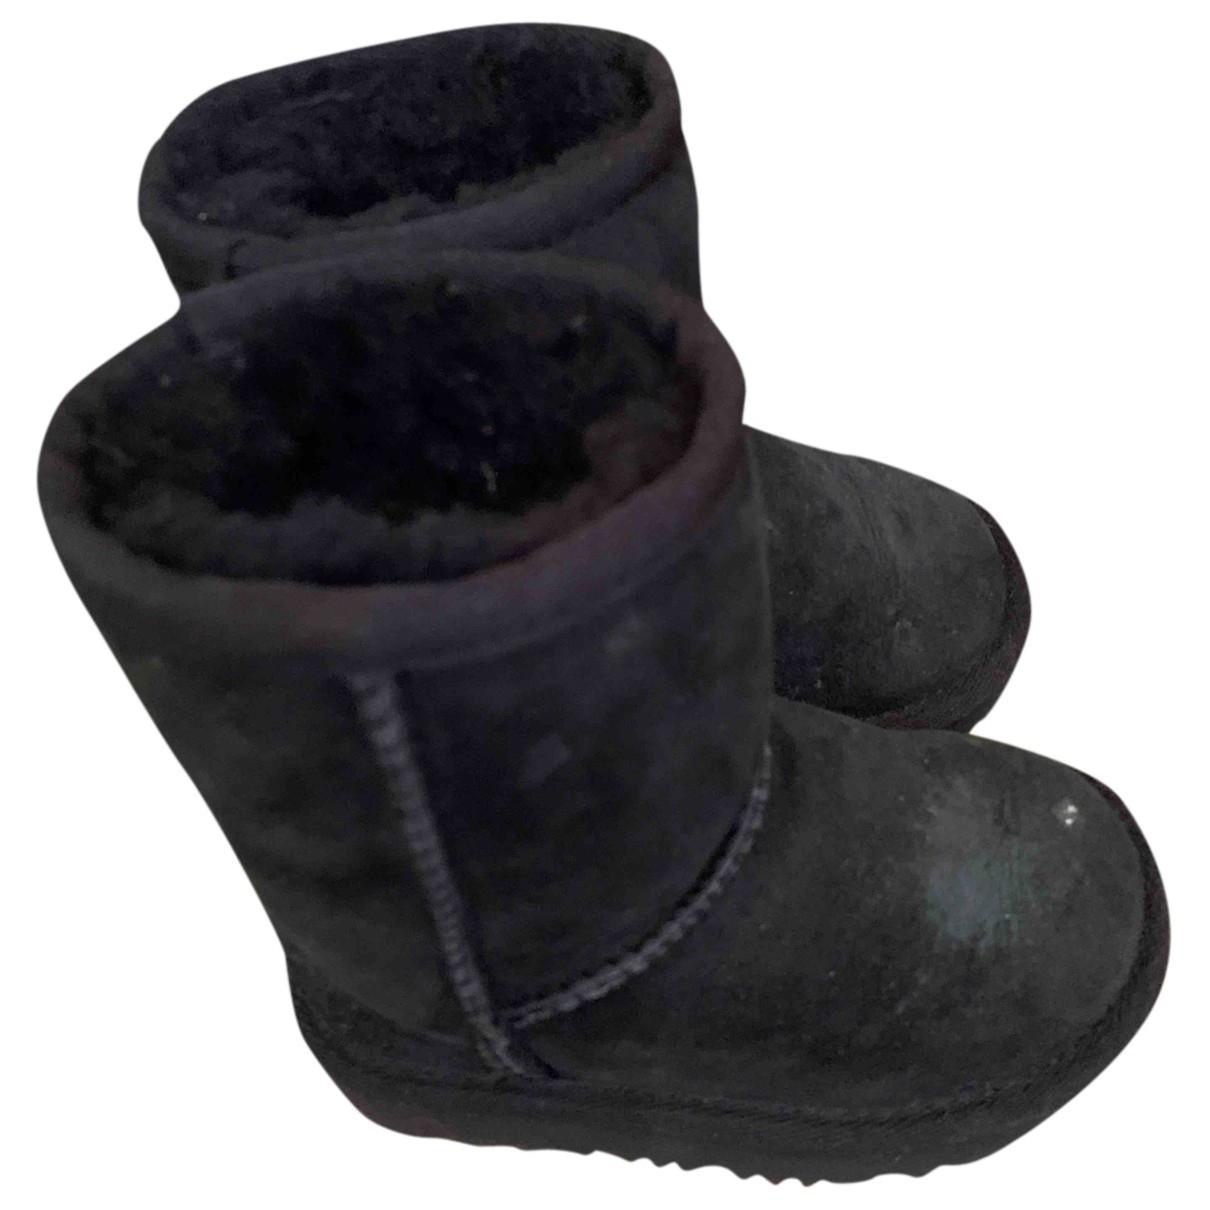 Ugg - Bottes.Bottines   pour enfant en cuir - noir